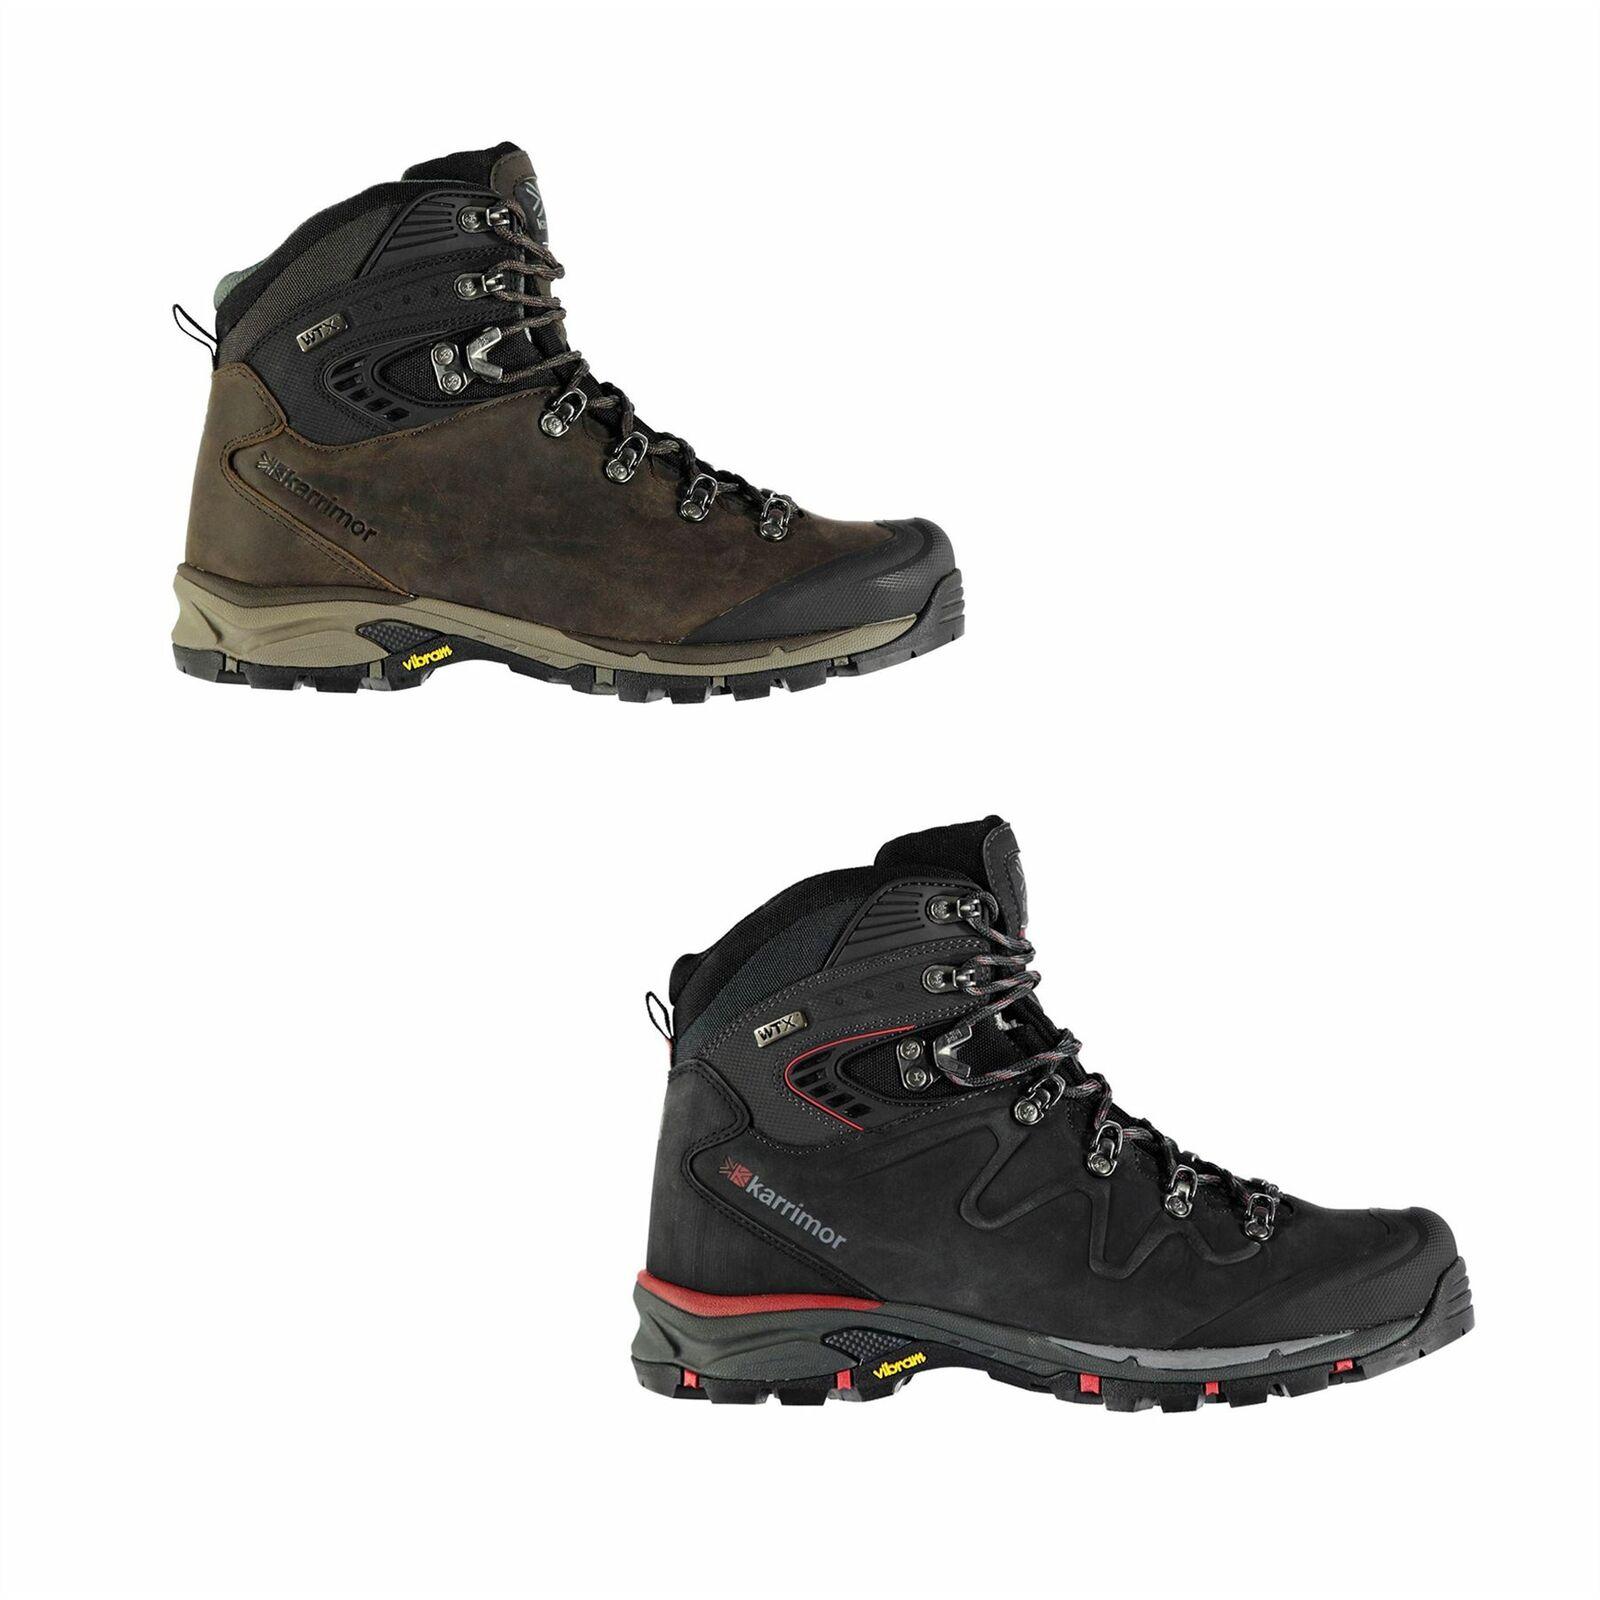 Merrell Moab 2 Mid Gore-Tex Walking Boots Mens Hiking Trekking shoes Footwear